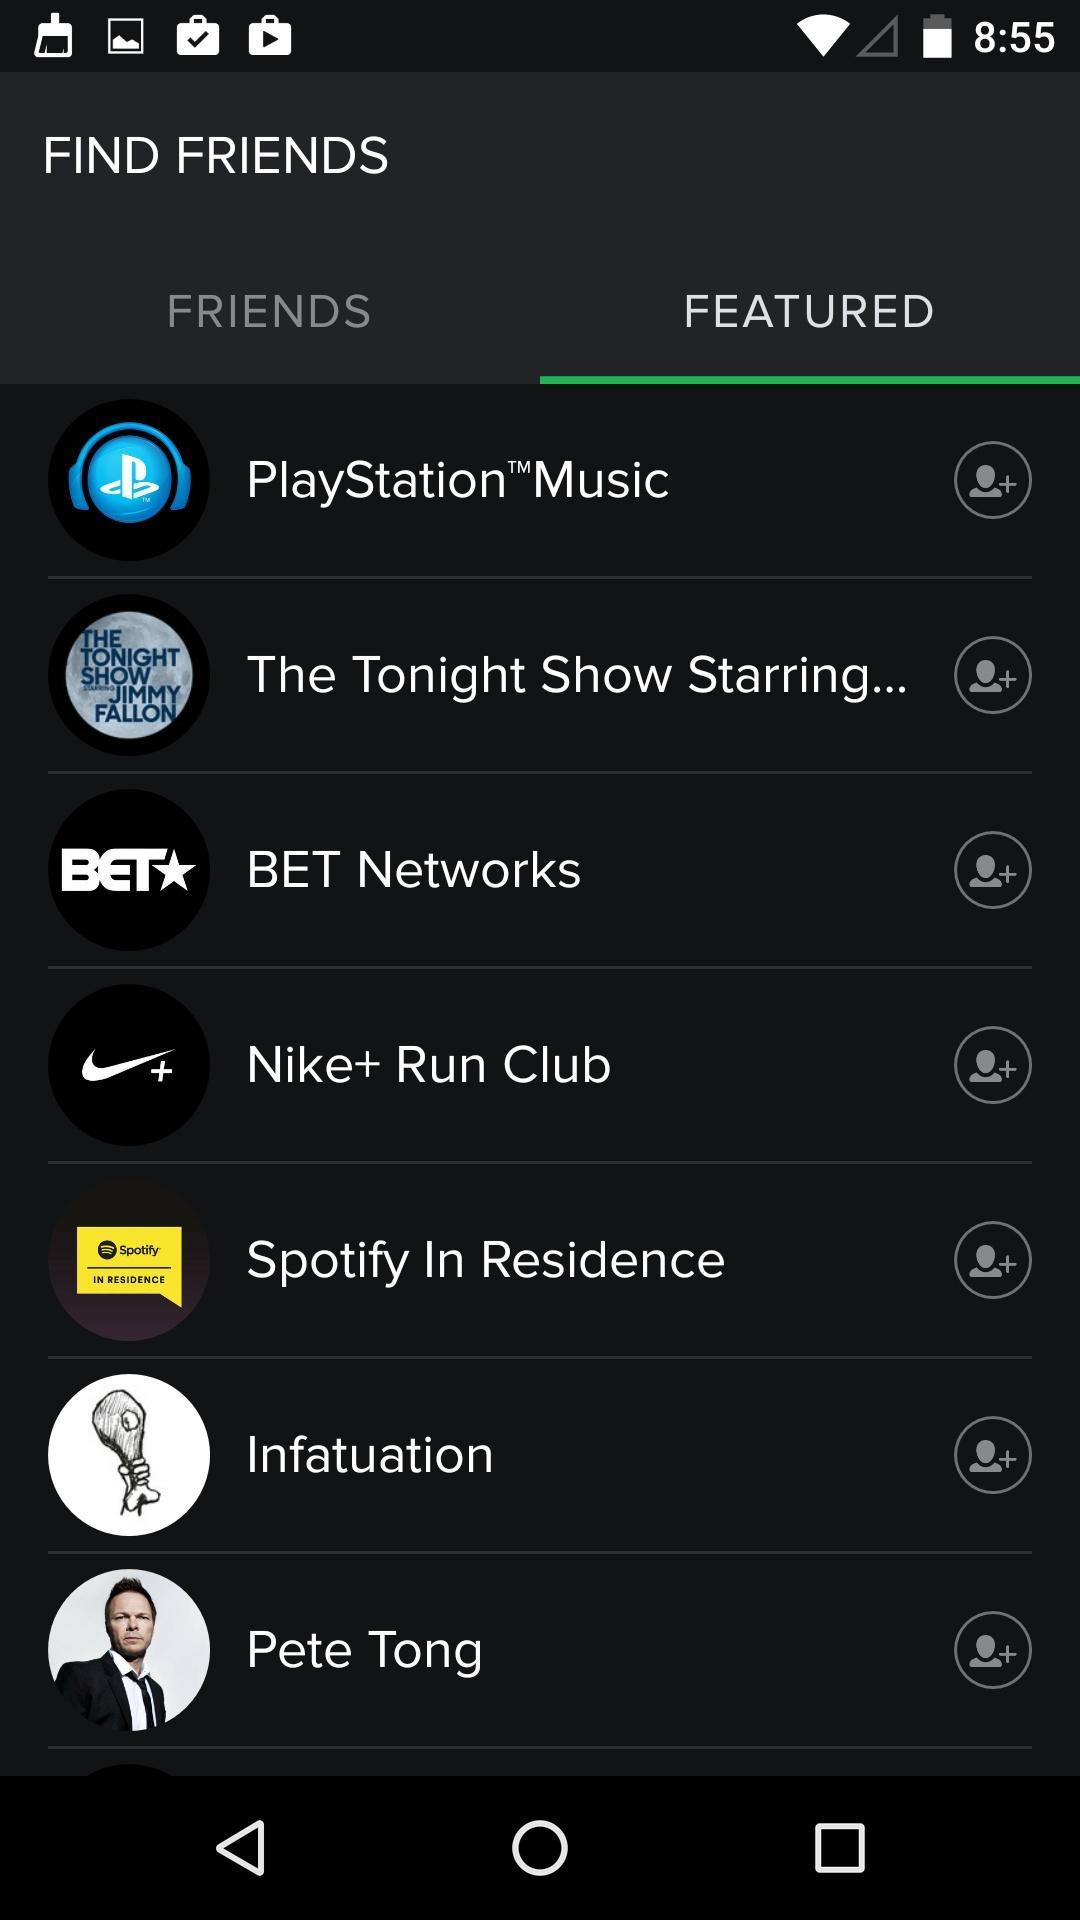 Spotify Music  查找好友